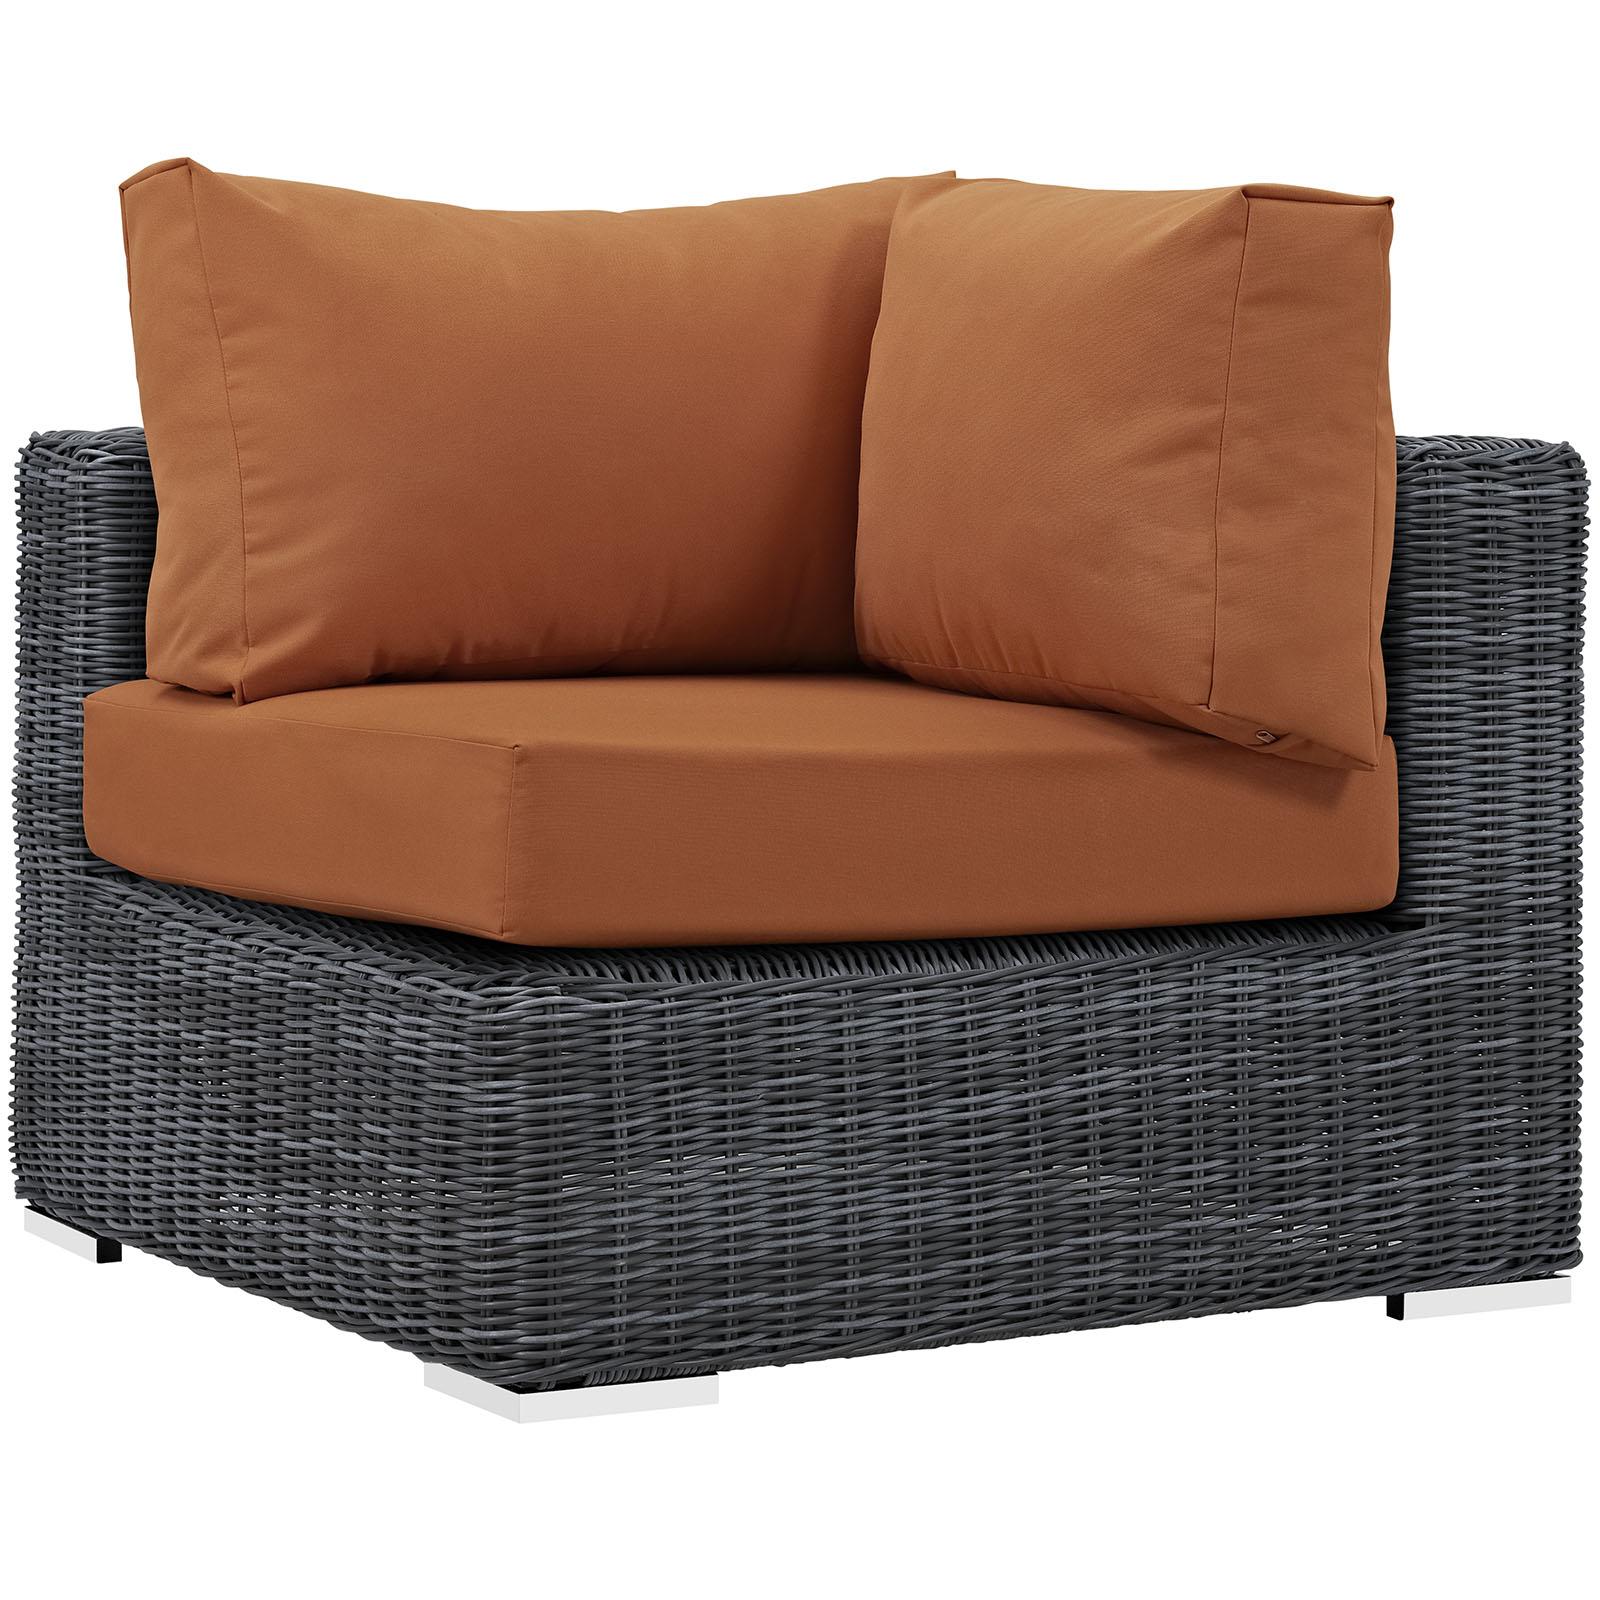 Modern Contemporary Urban Design Outdoor Patio Balcony Corner Lounge Chair, Orange, Rattan